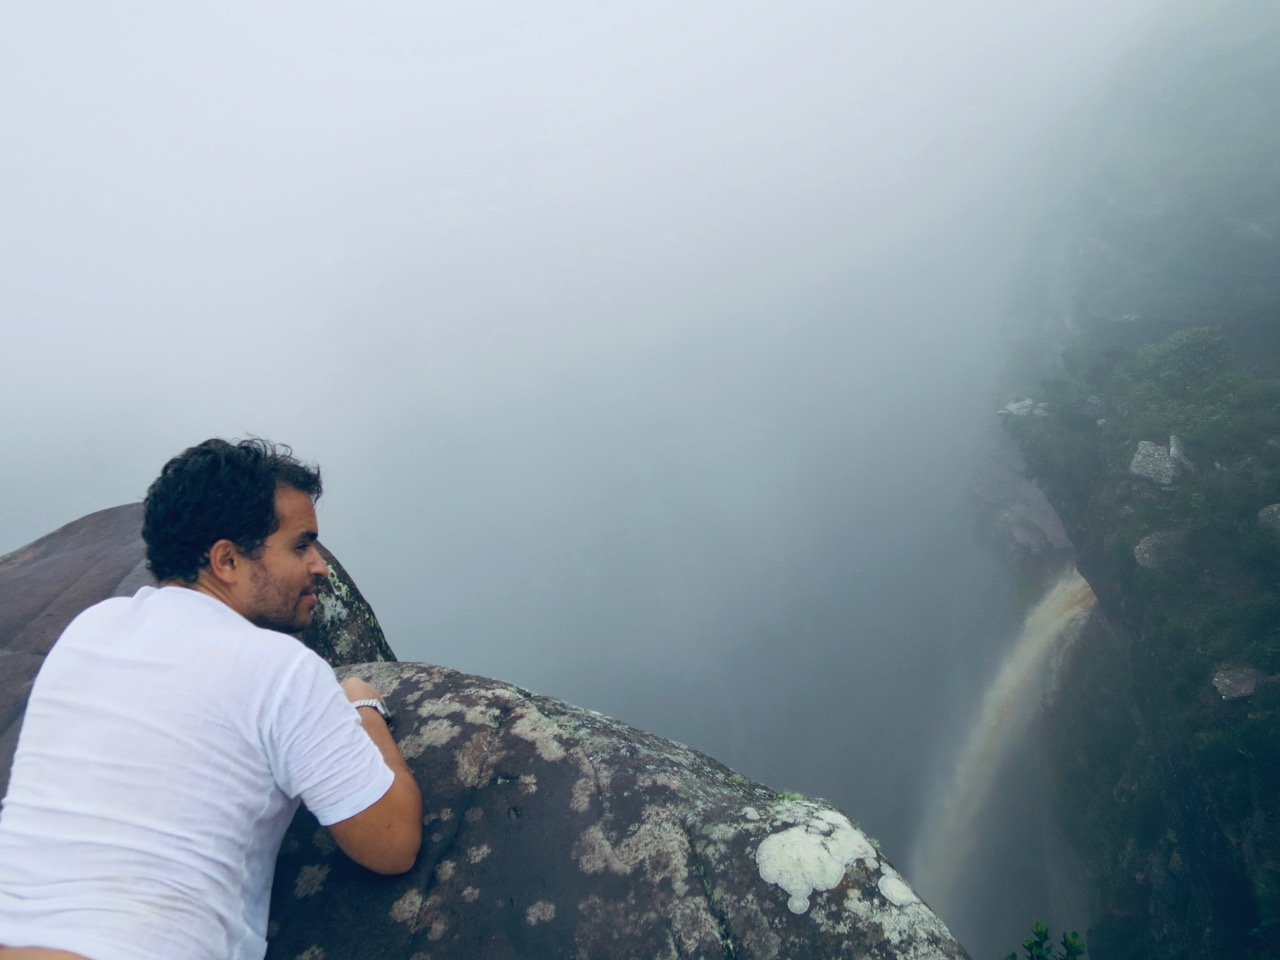 Cachoeira da Fumaca 1 19b